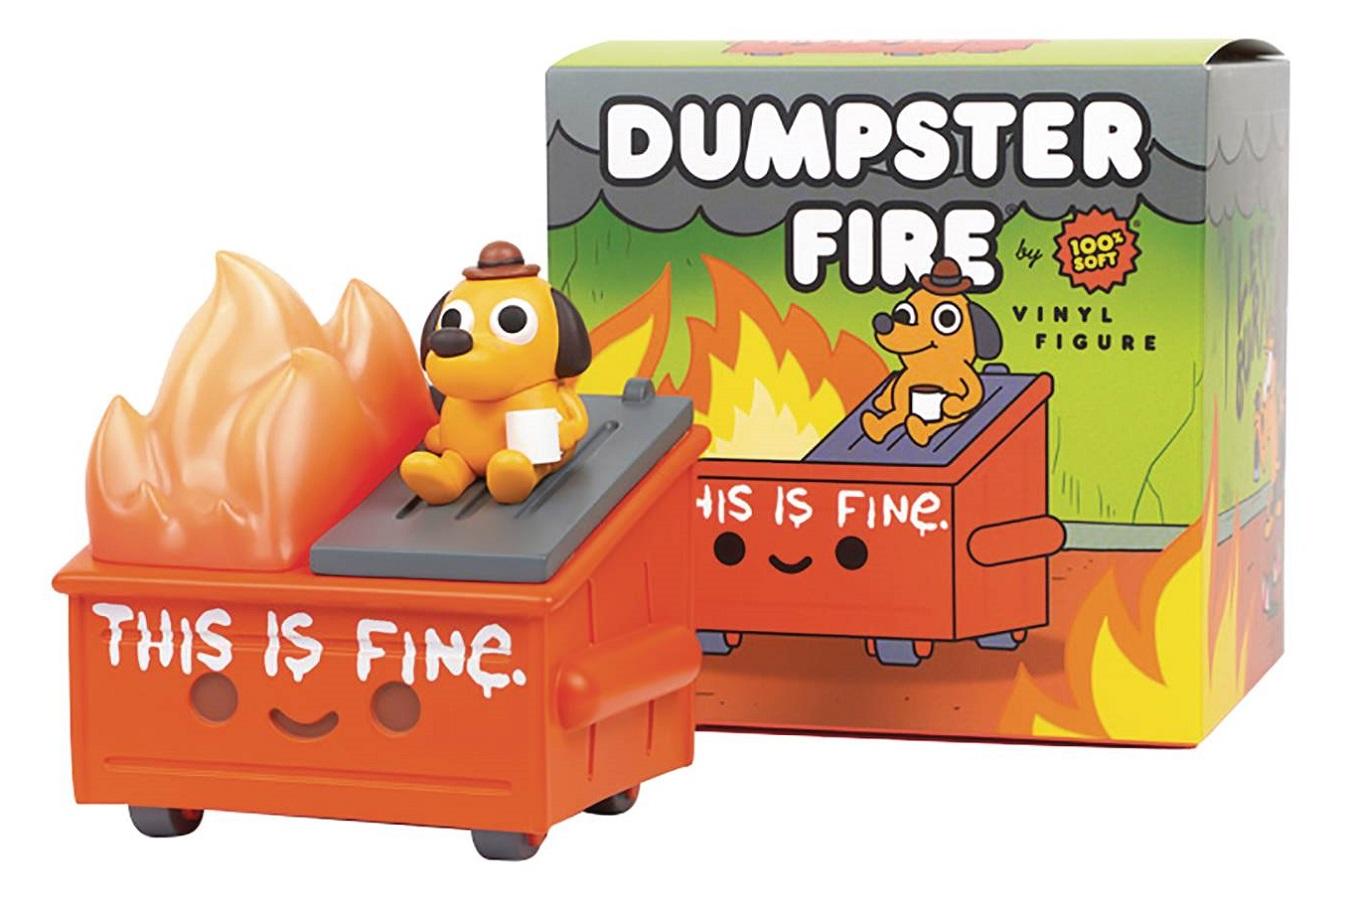 LIL DUMPSTER FIRE – THIS IS FINE VINYL FIGURE